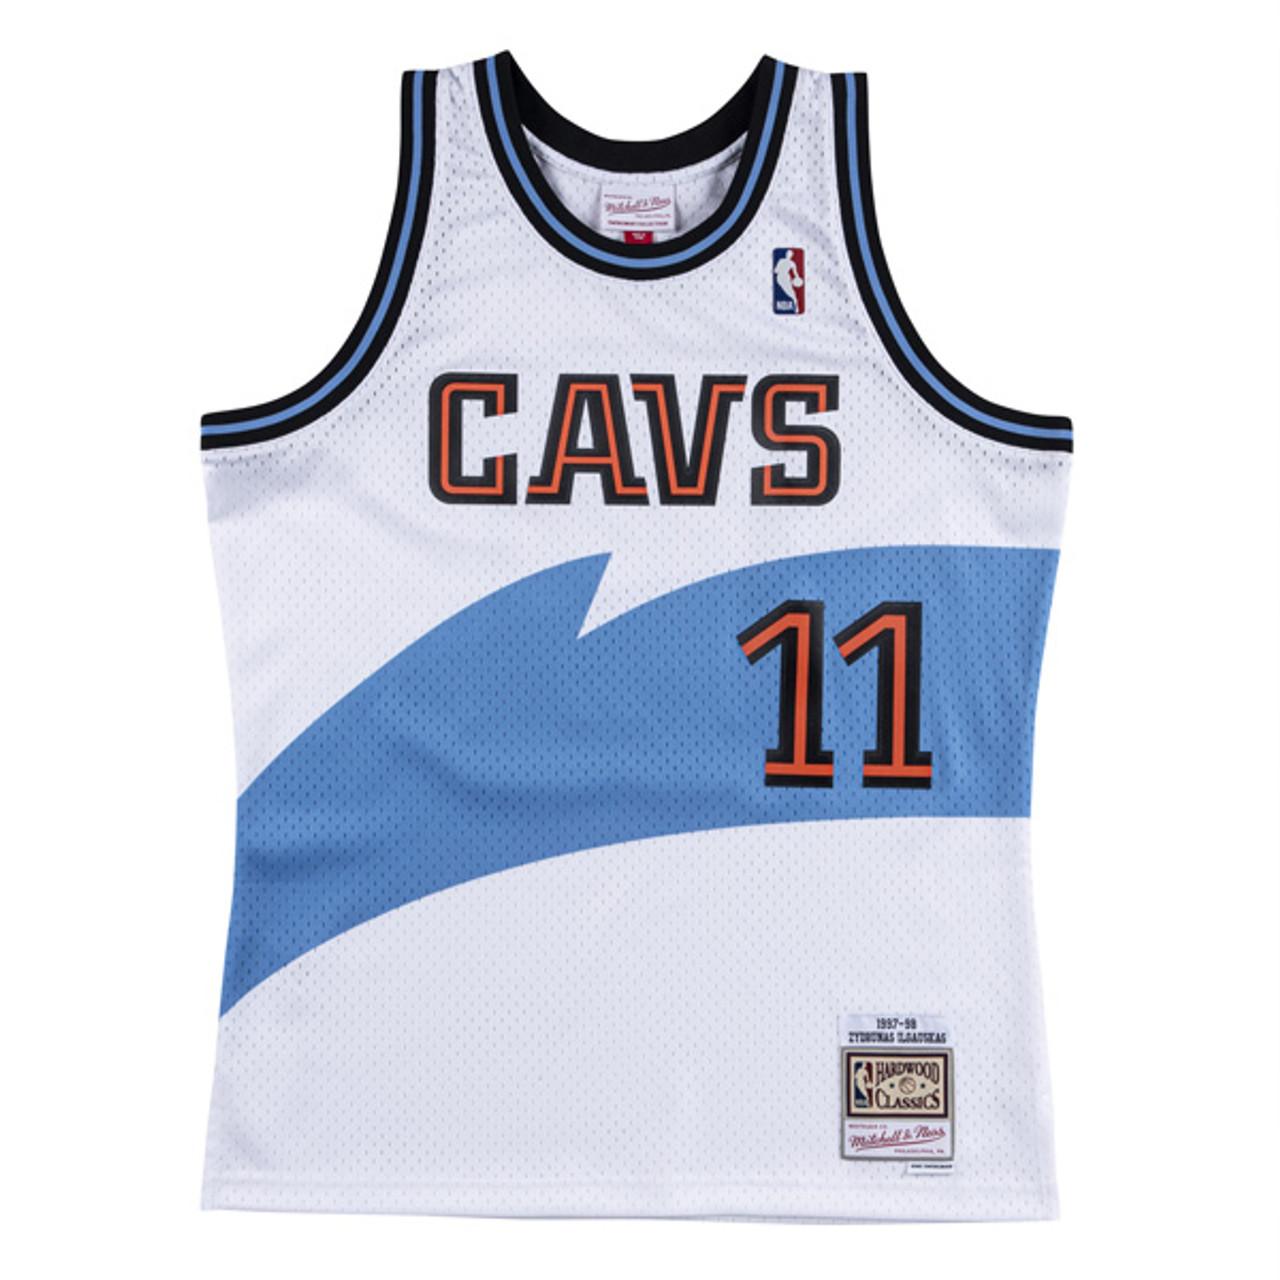 cavaliers white jersey